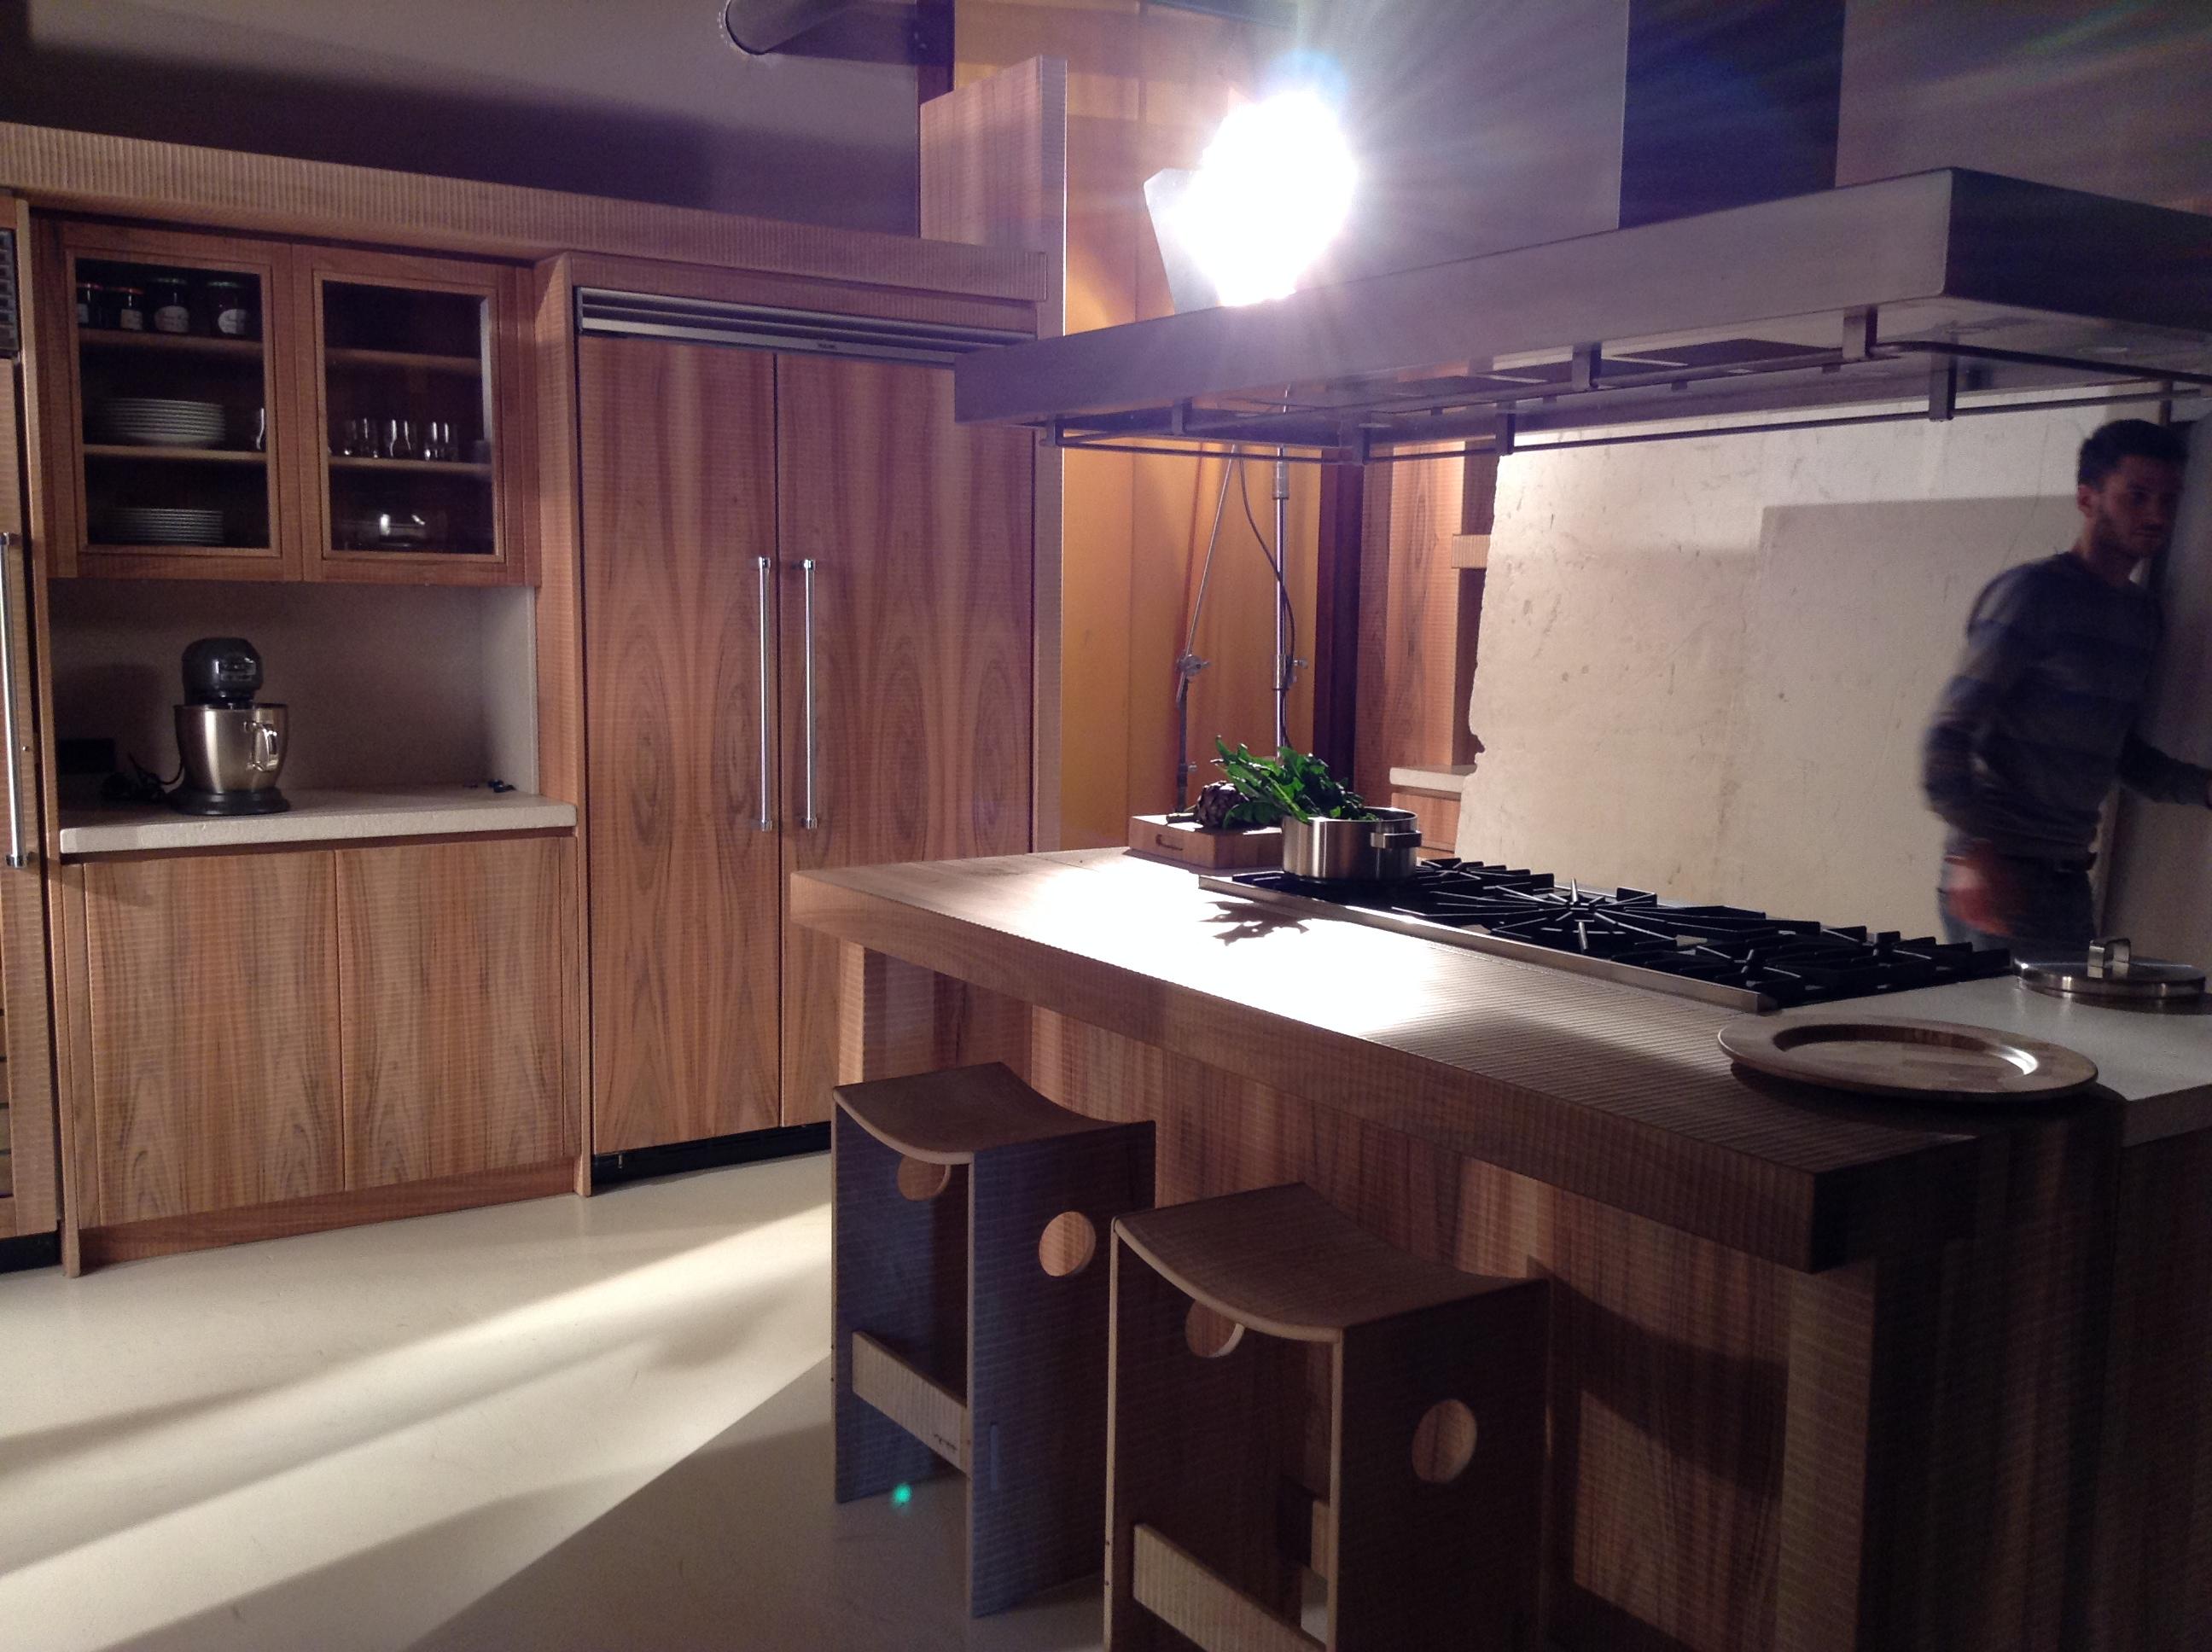 Habito Catalogue 2015 Work in Progress. Wood kitchen set